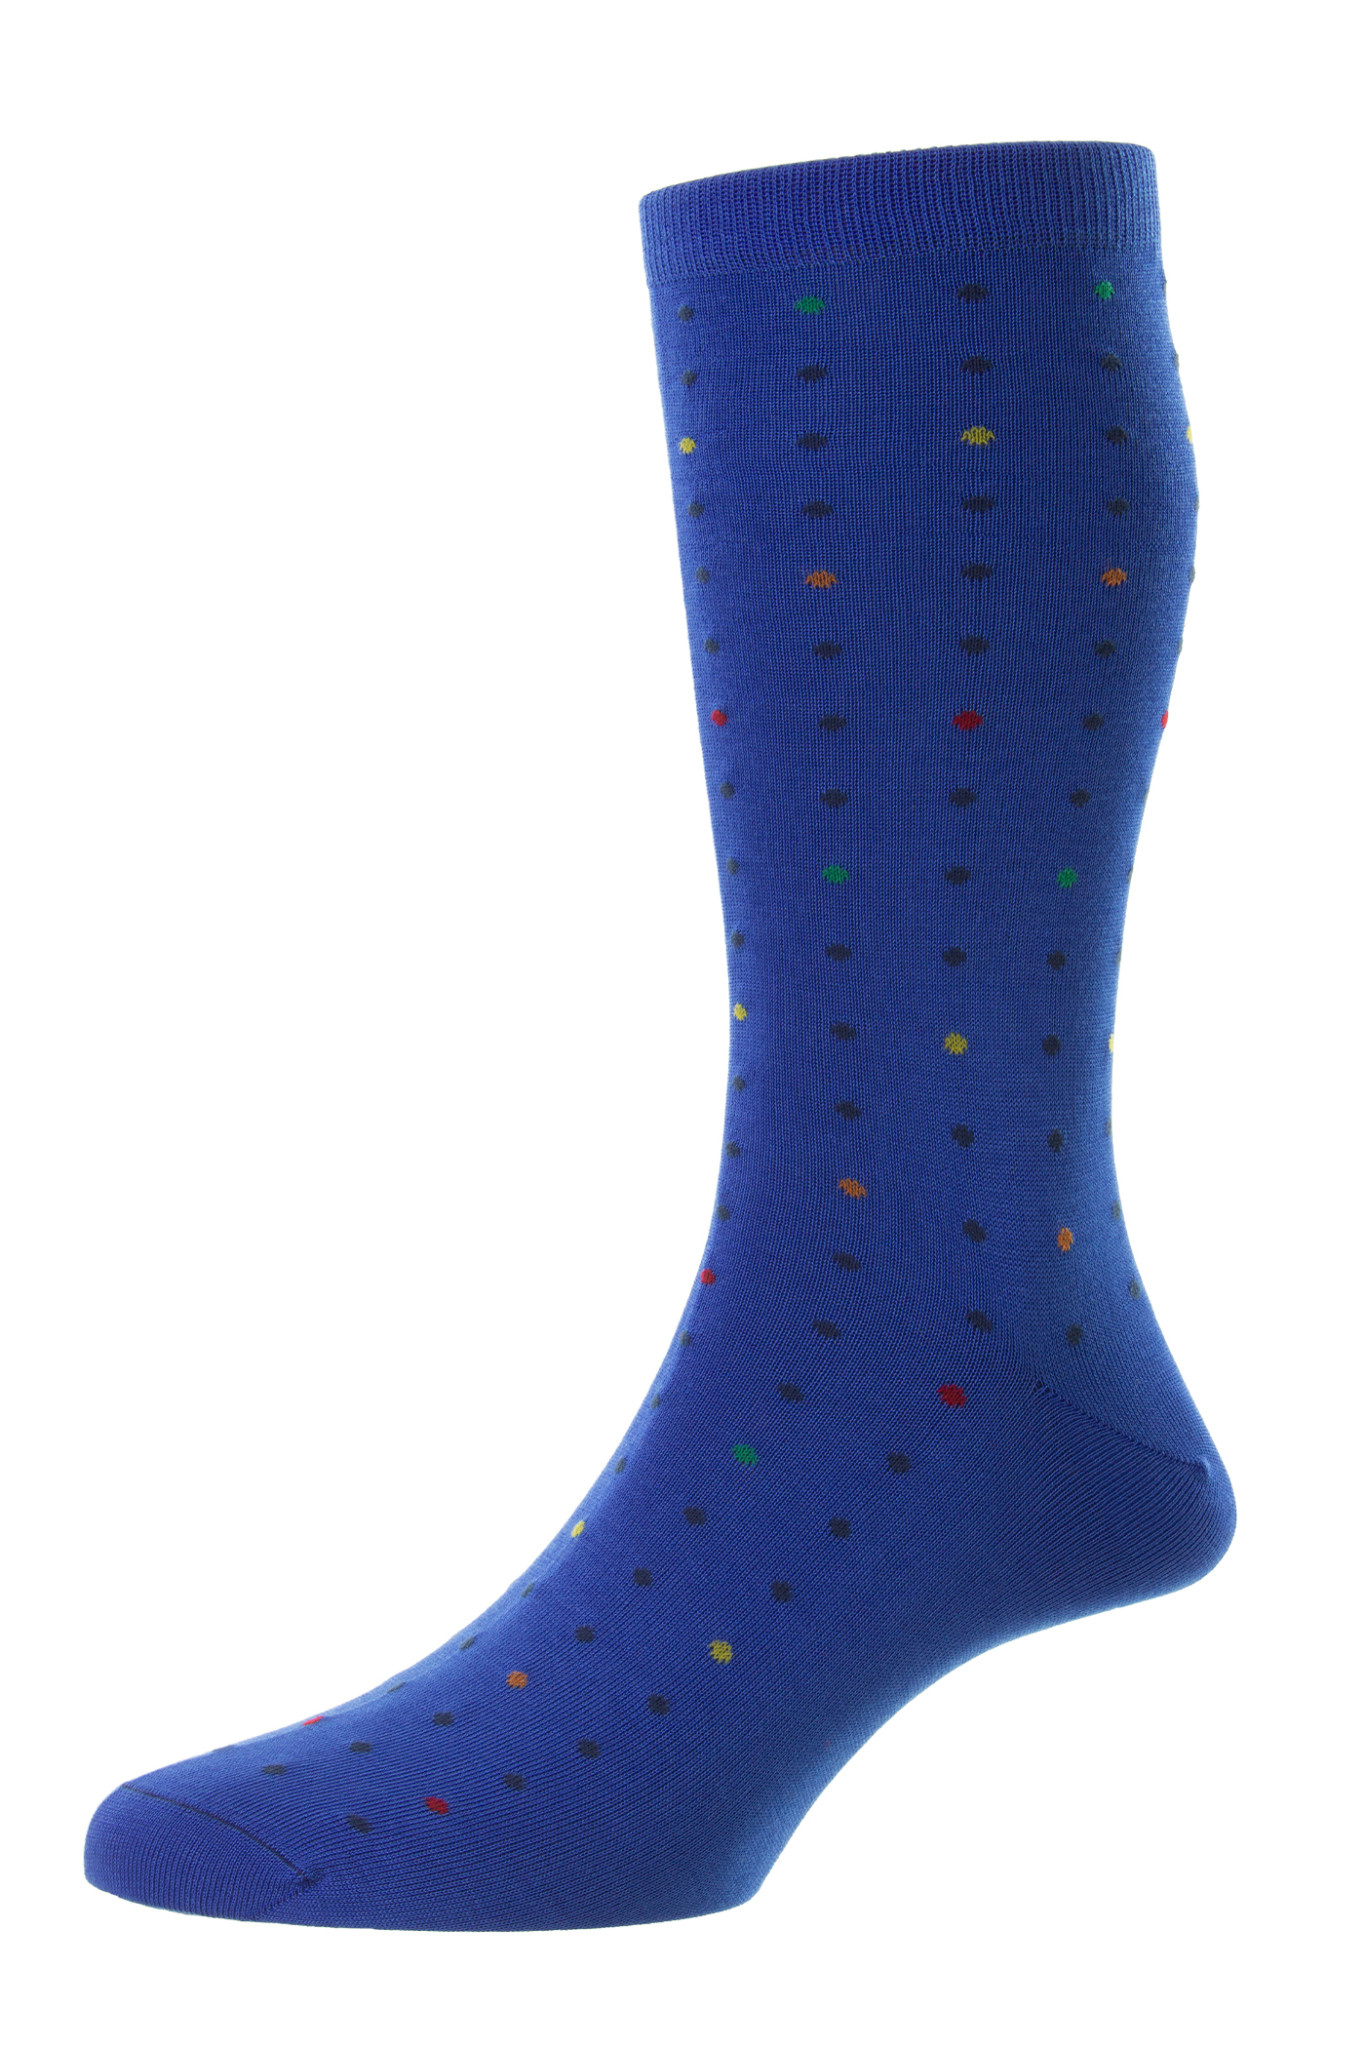 Pantherella New Mini Spot Sock - Shelford